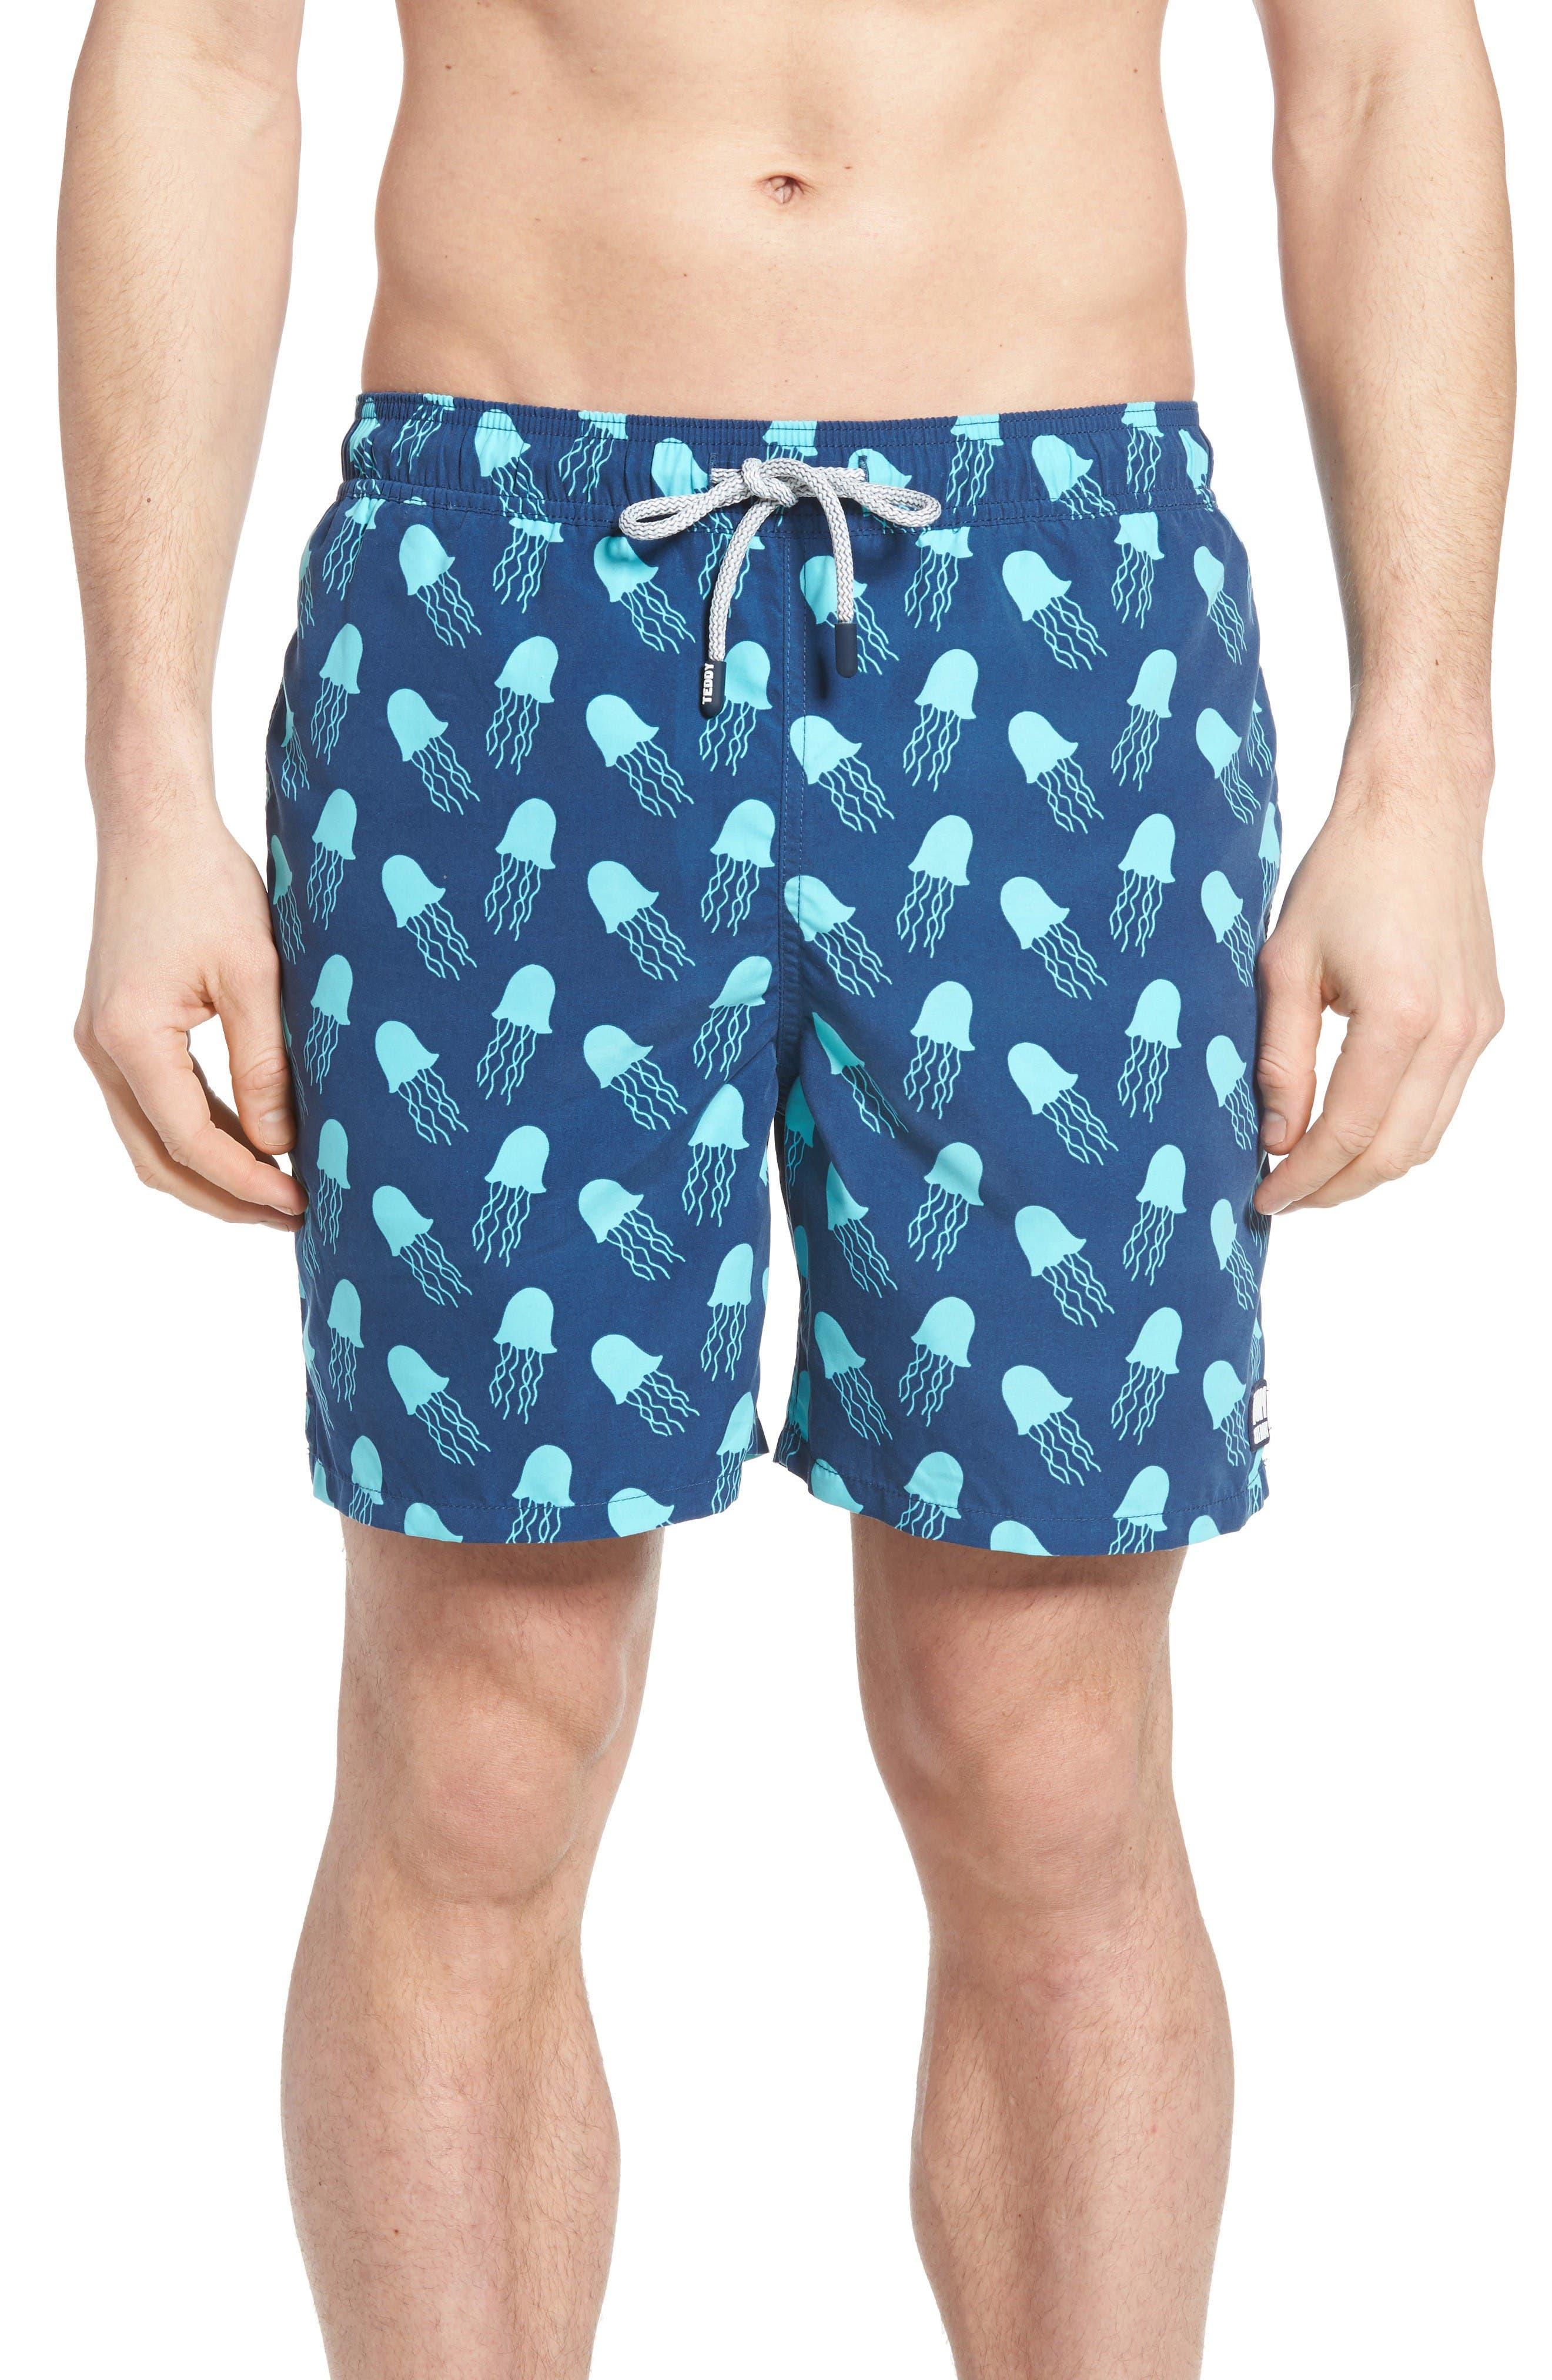 Jellyfish Print Swim Trunks,                         Main,                         color, Navy Turquoise